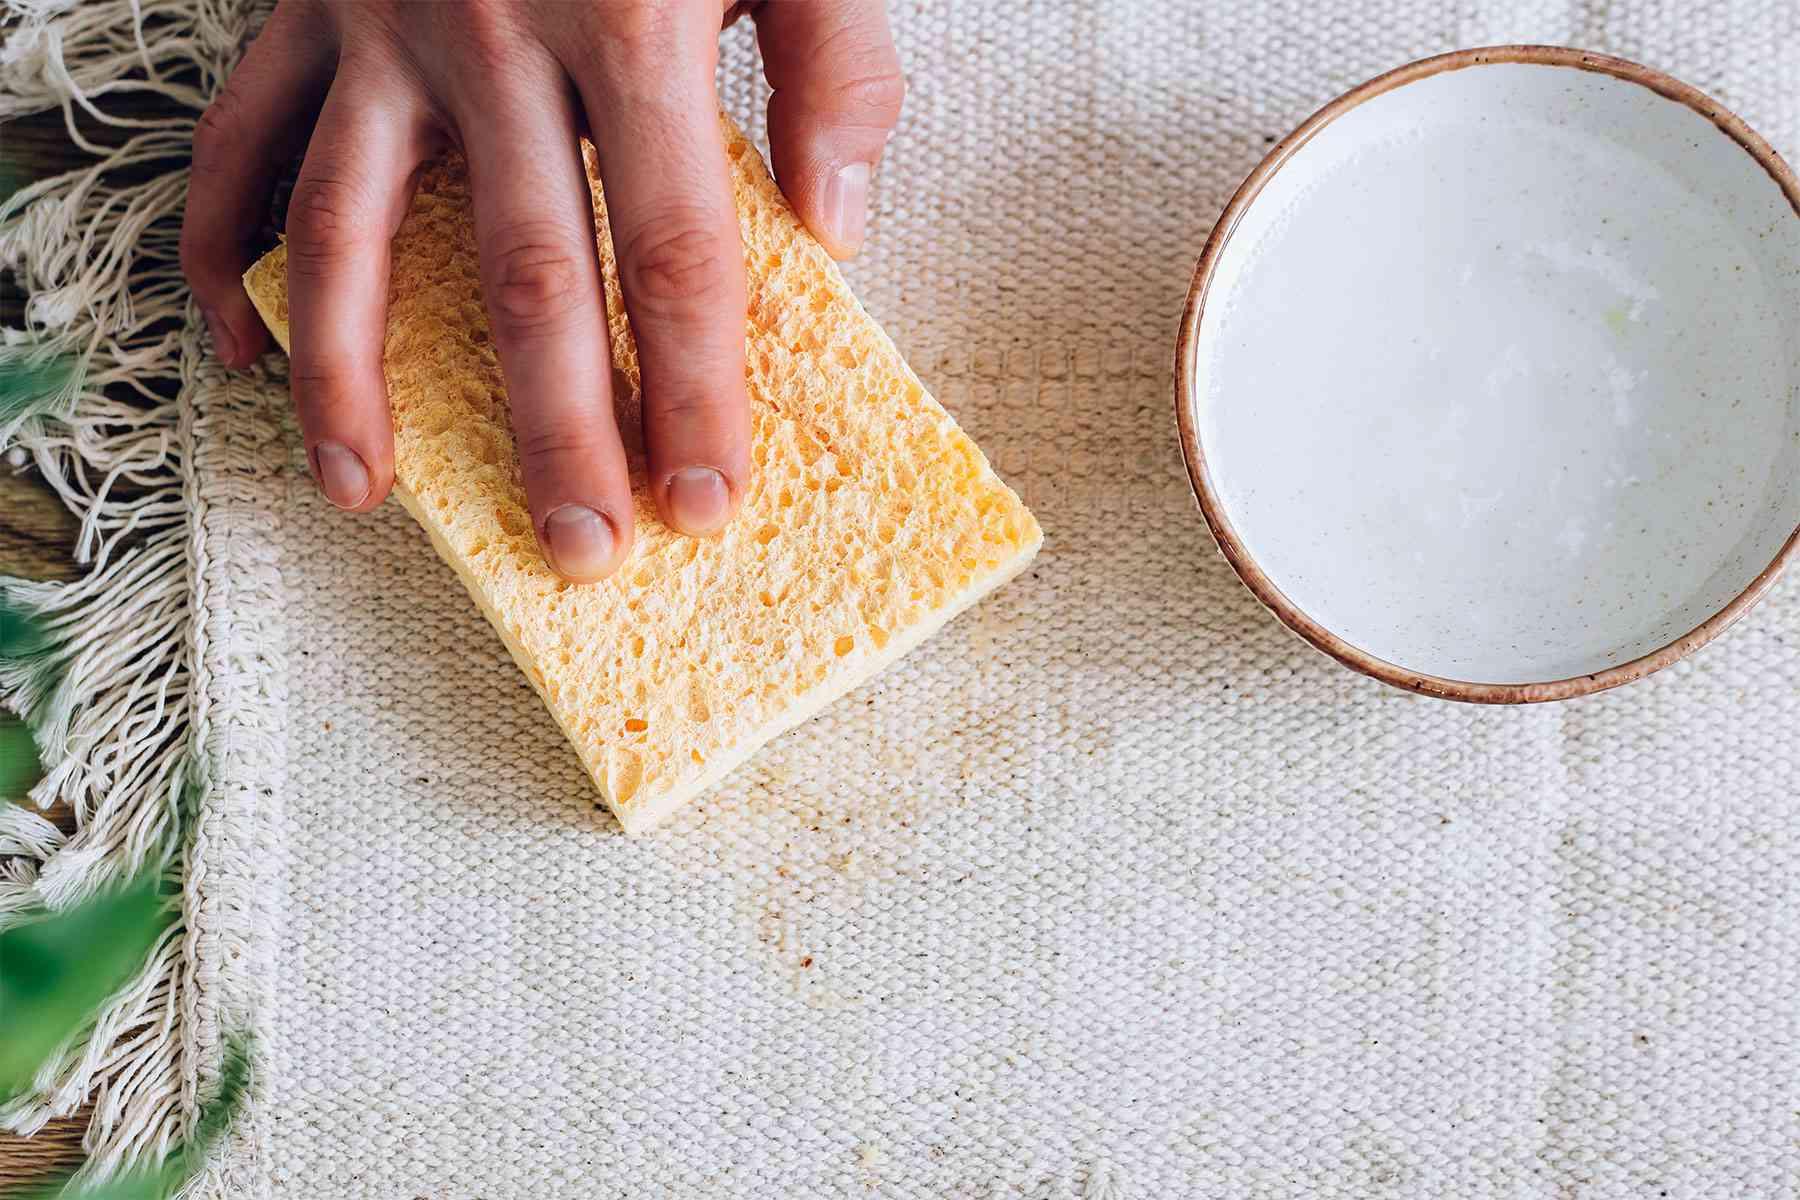 Sponge absorbing vomit stained carpet